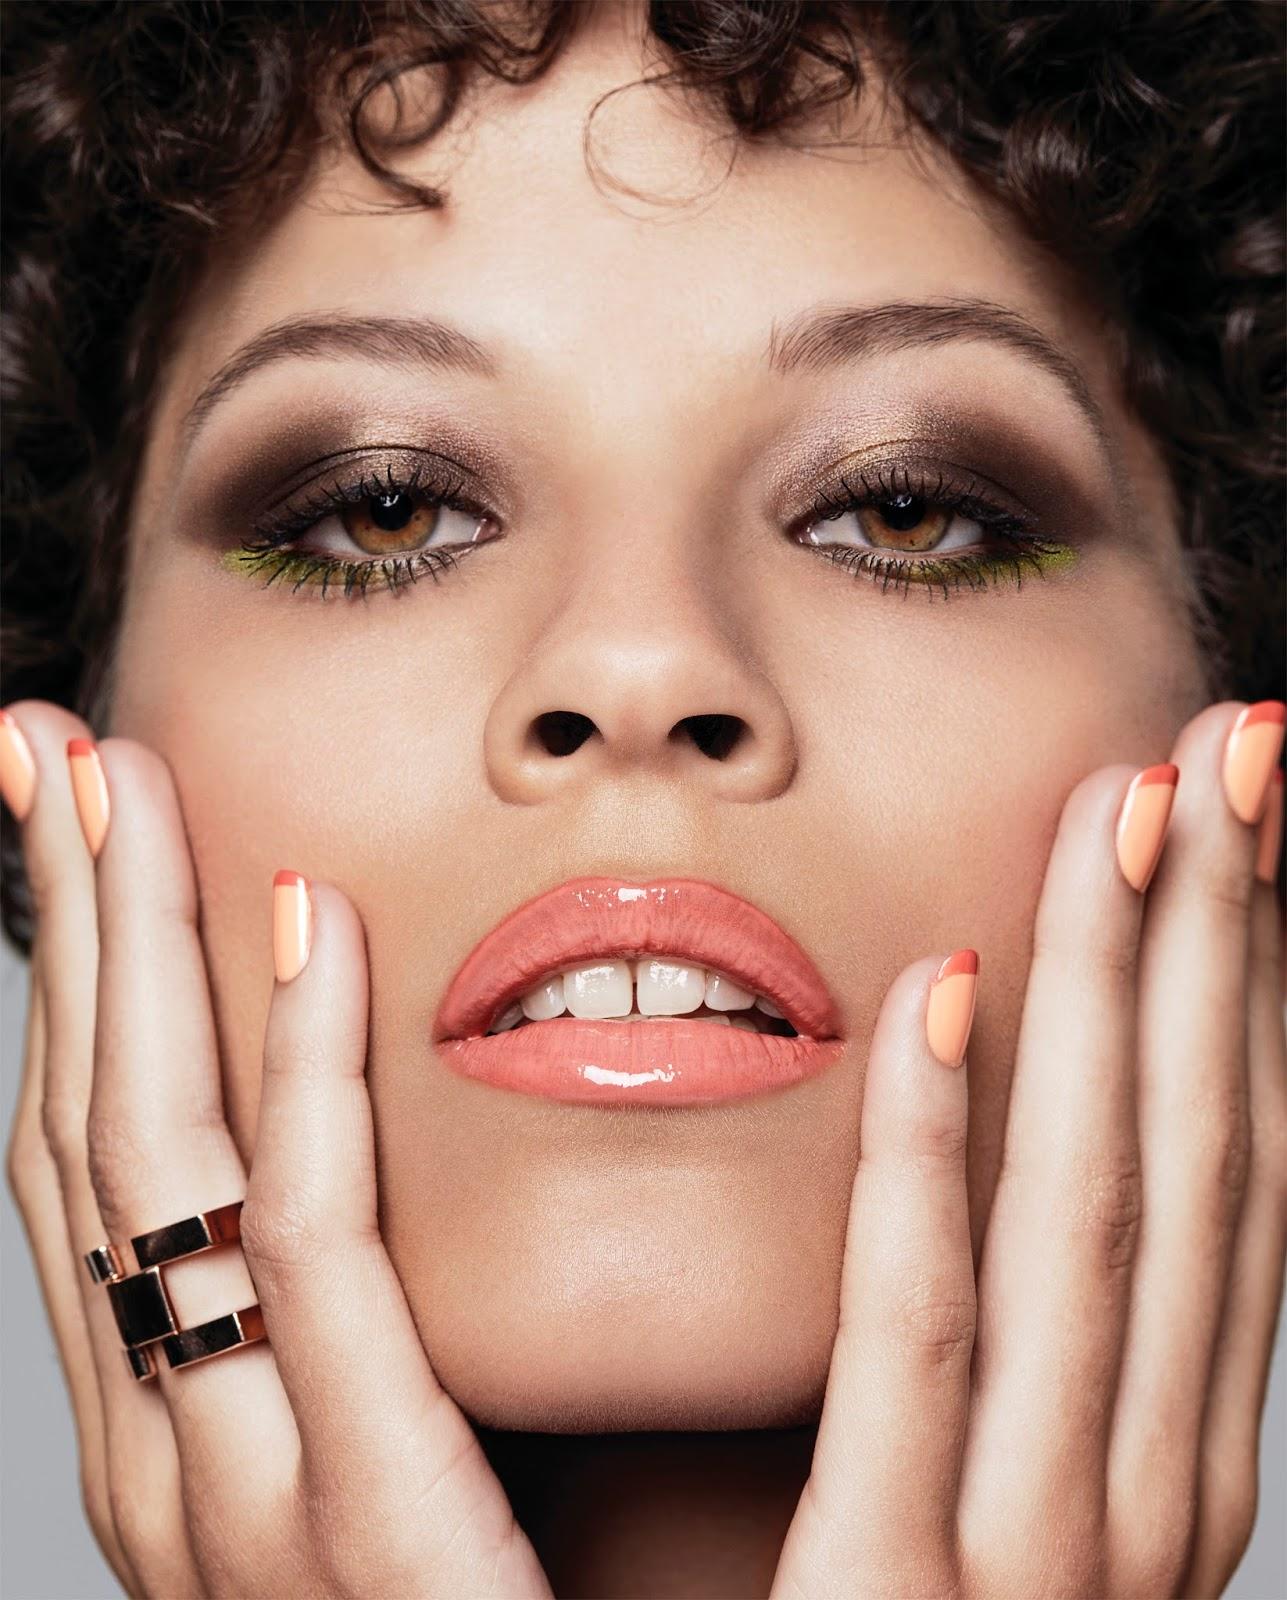 Smile: 'Shades Of Beauty' In Harper's Bazaar International